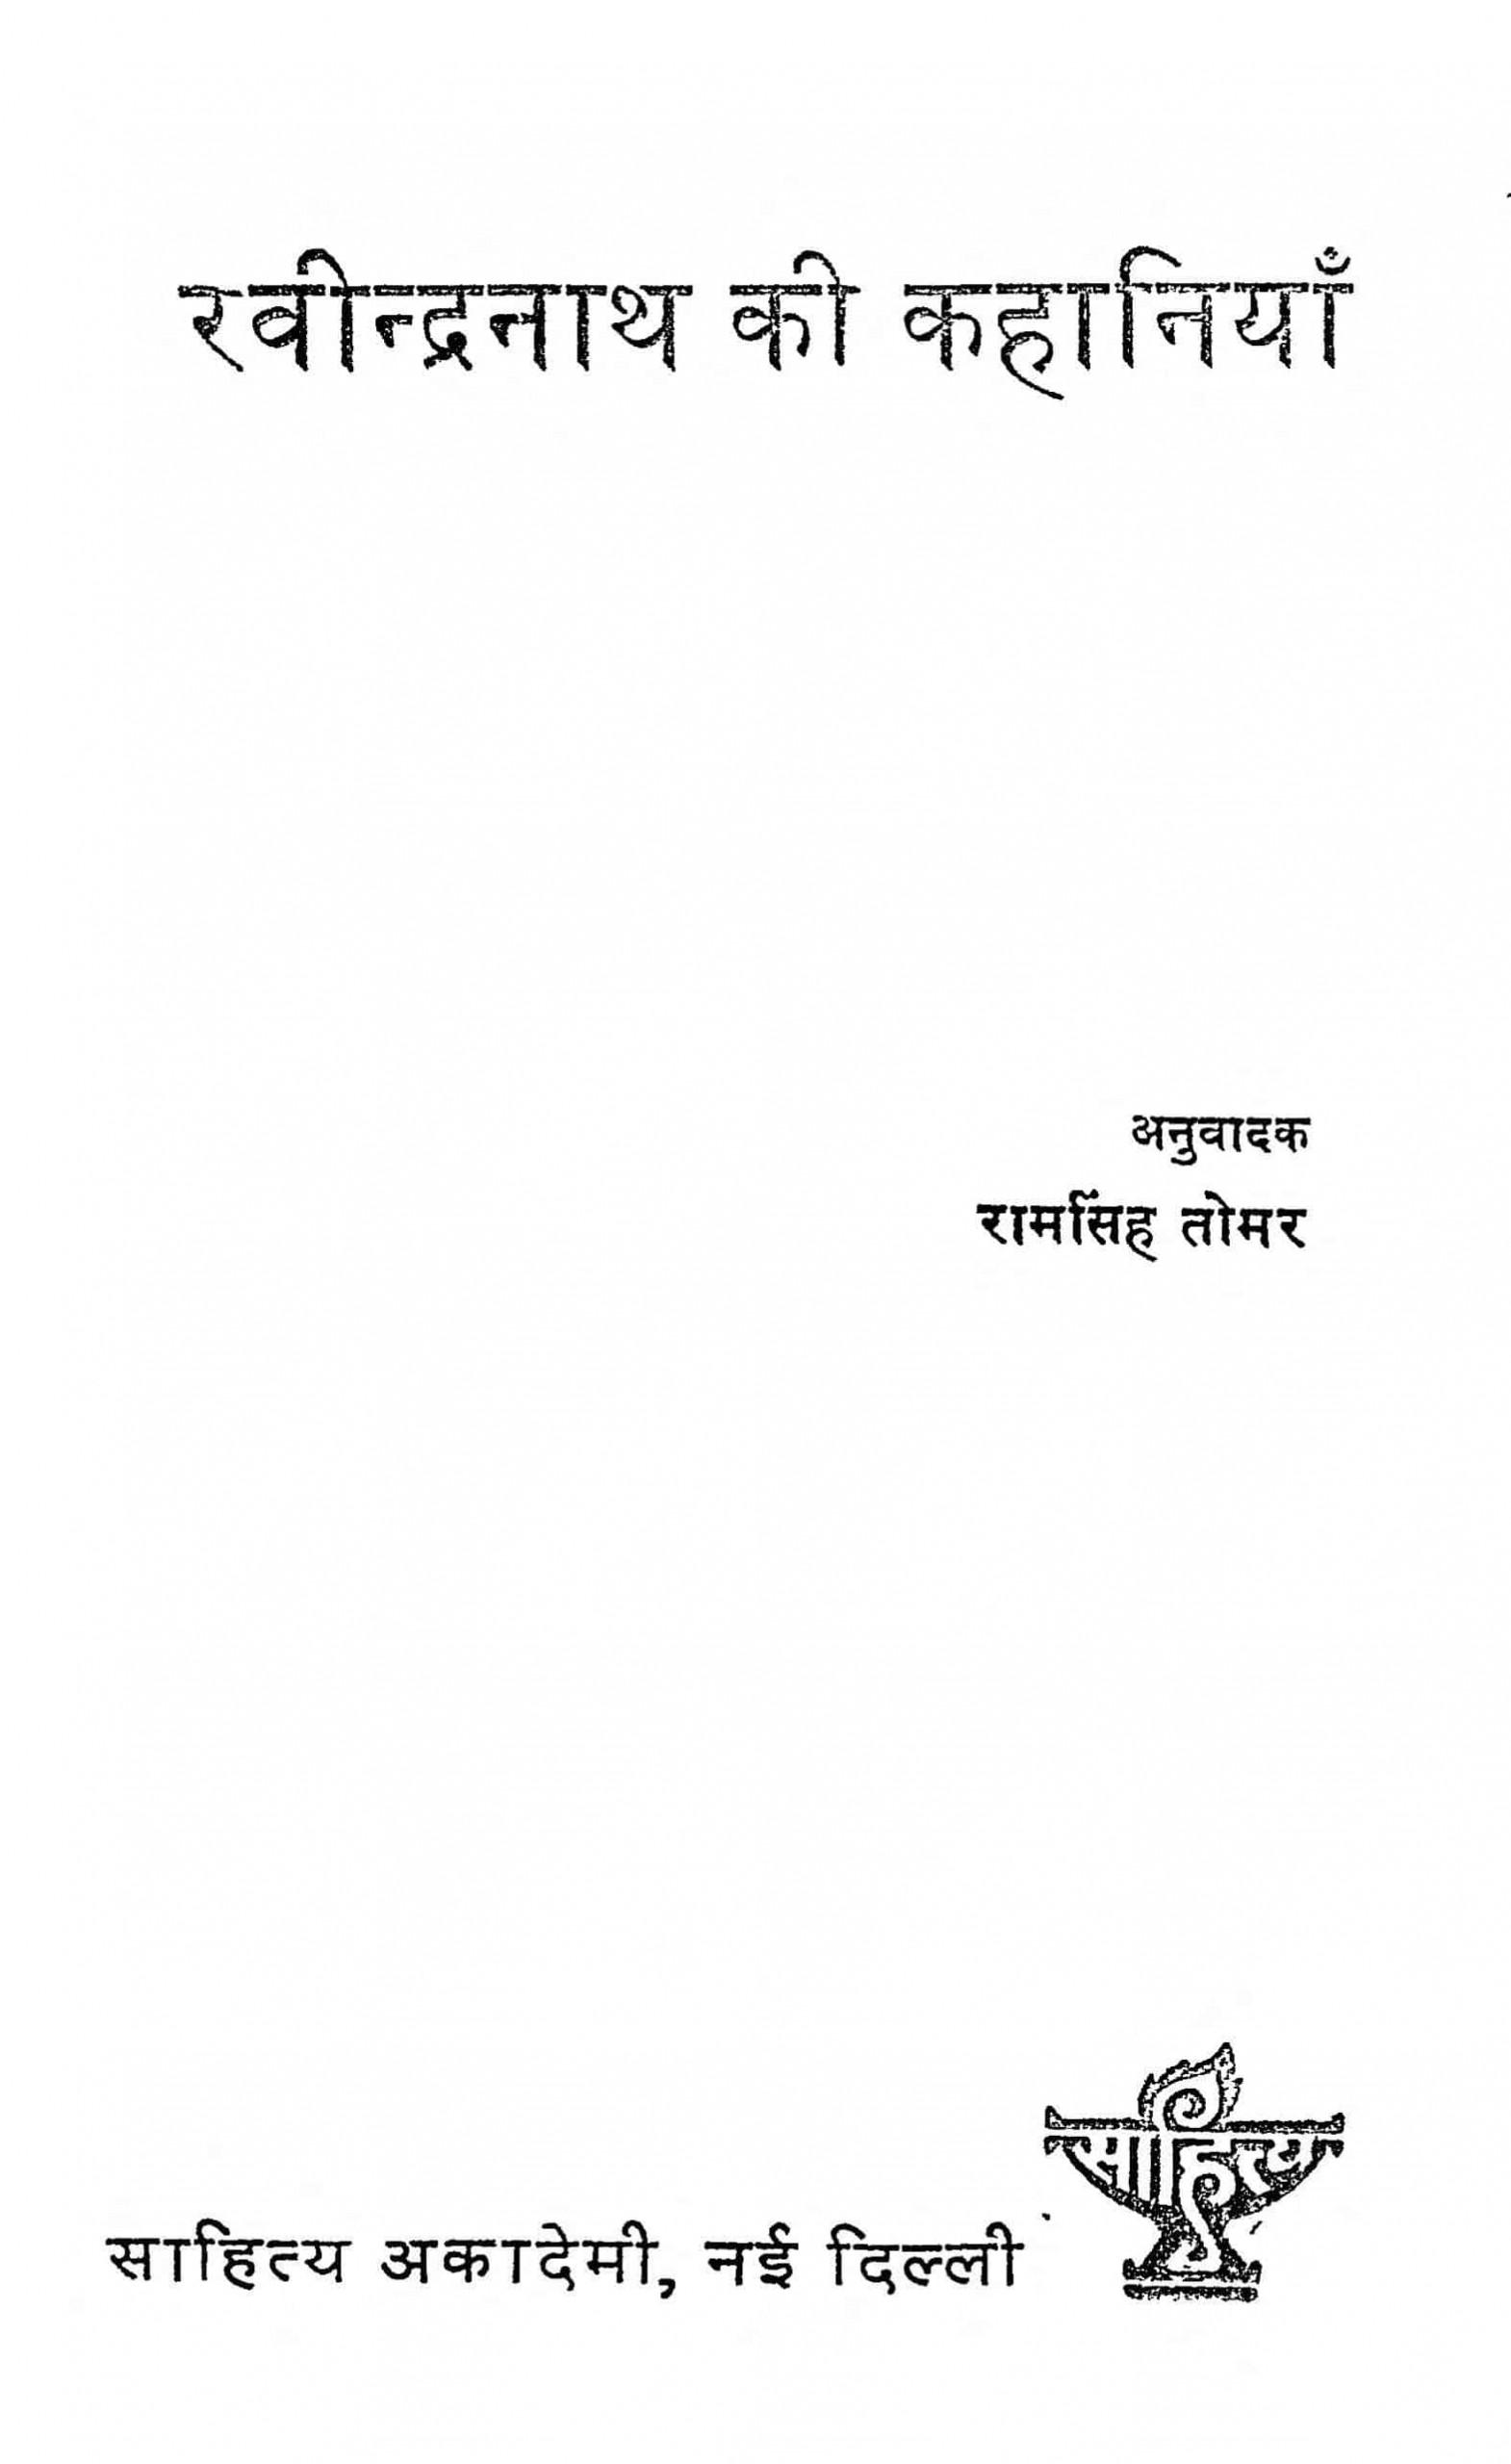 Book Image : रवीन्द्रनाथ की कहानियां - Ravindranath Ki Kahaniya